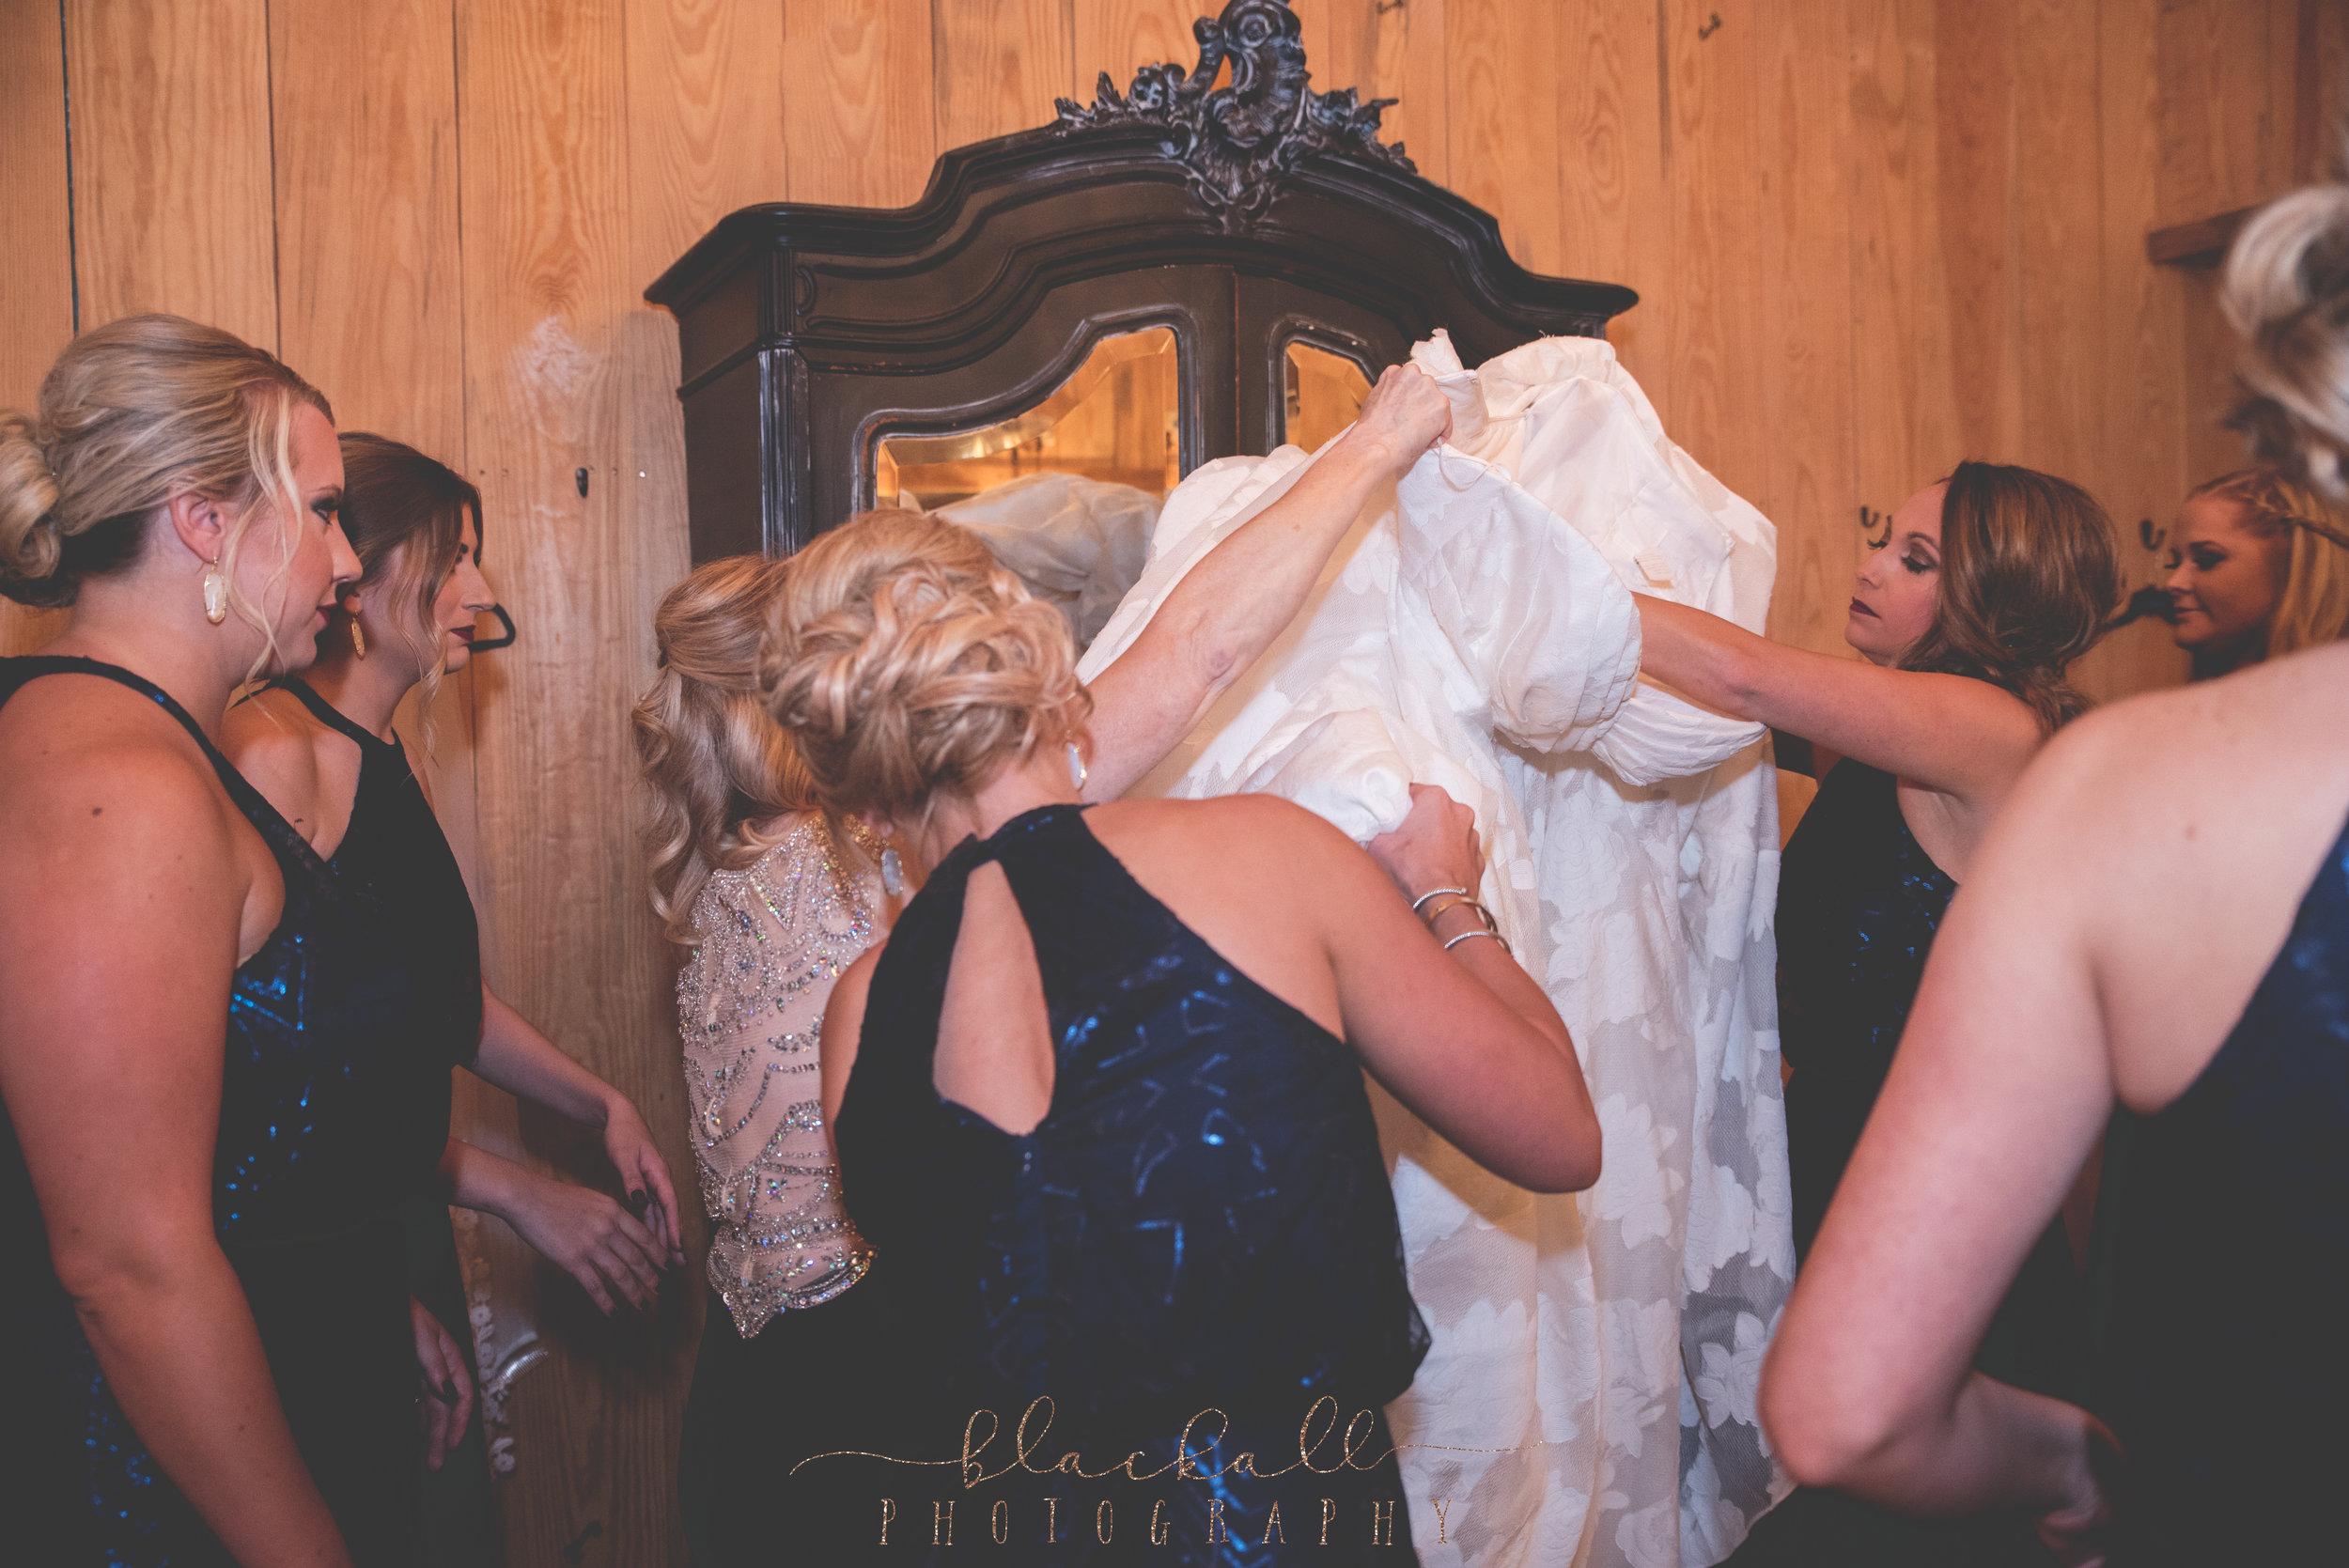 M&M WEDDING_Blackall Photography-21.JPG